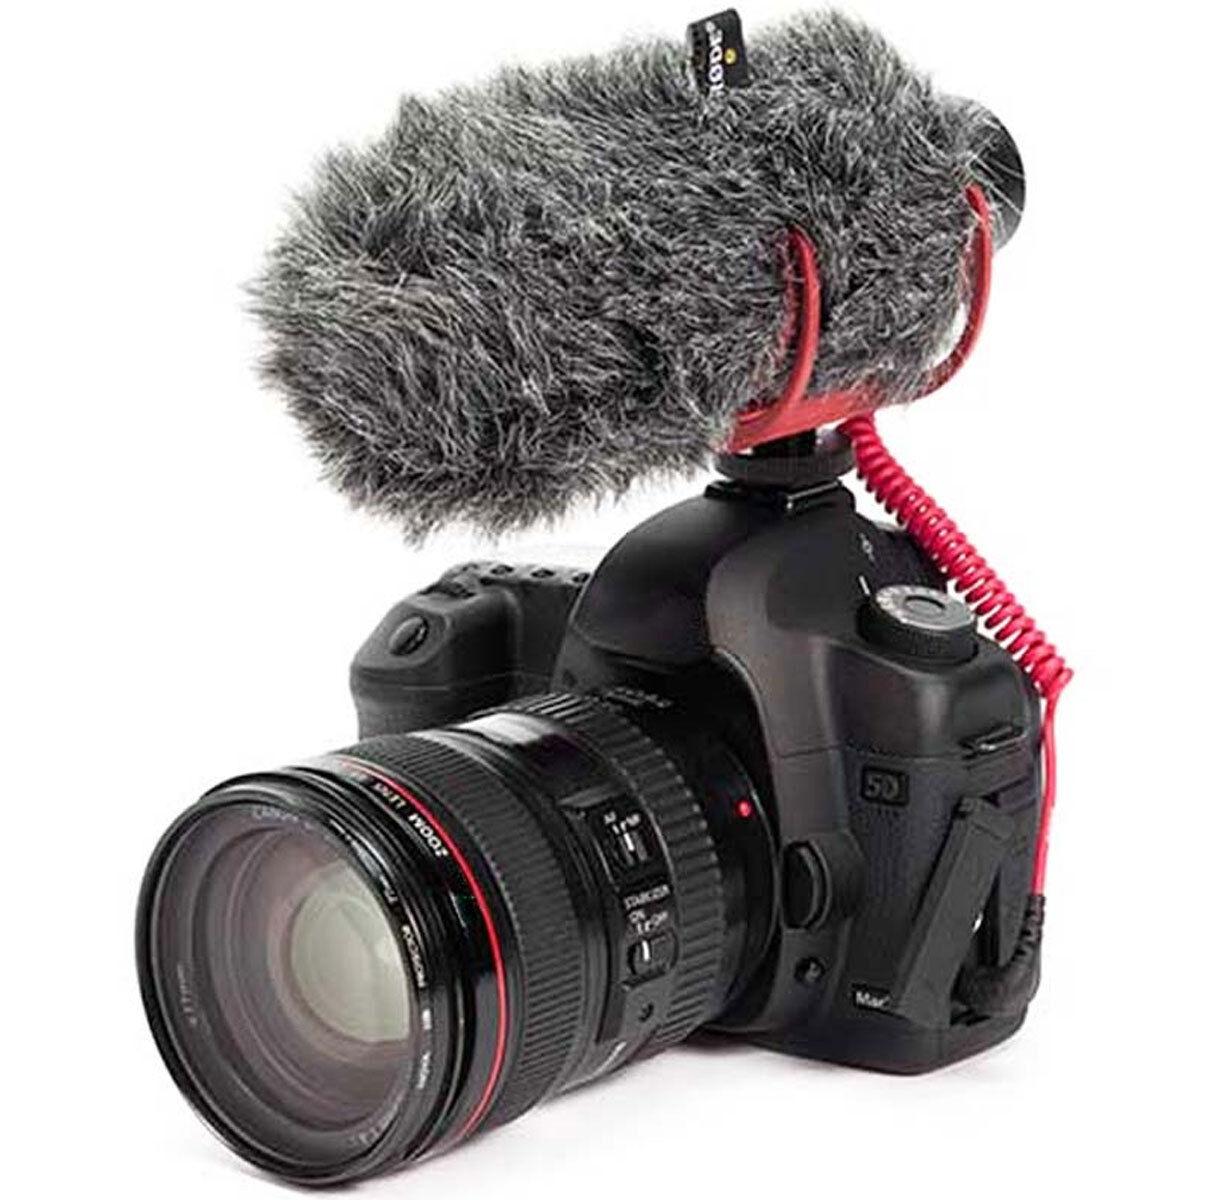 New Rode VideoMic GO hot Shoe On-Camera Shotgun Microphone + Rode VM GO Dead Cat 2